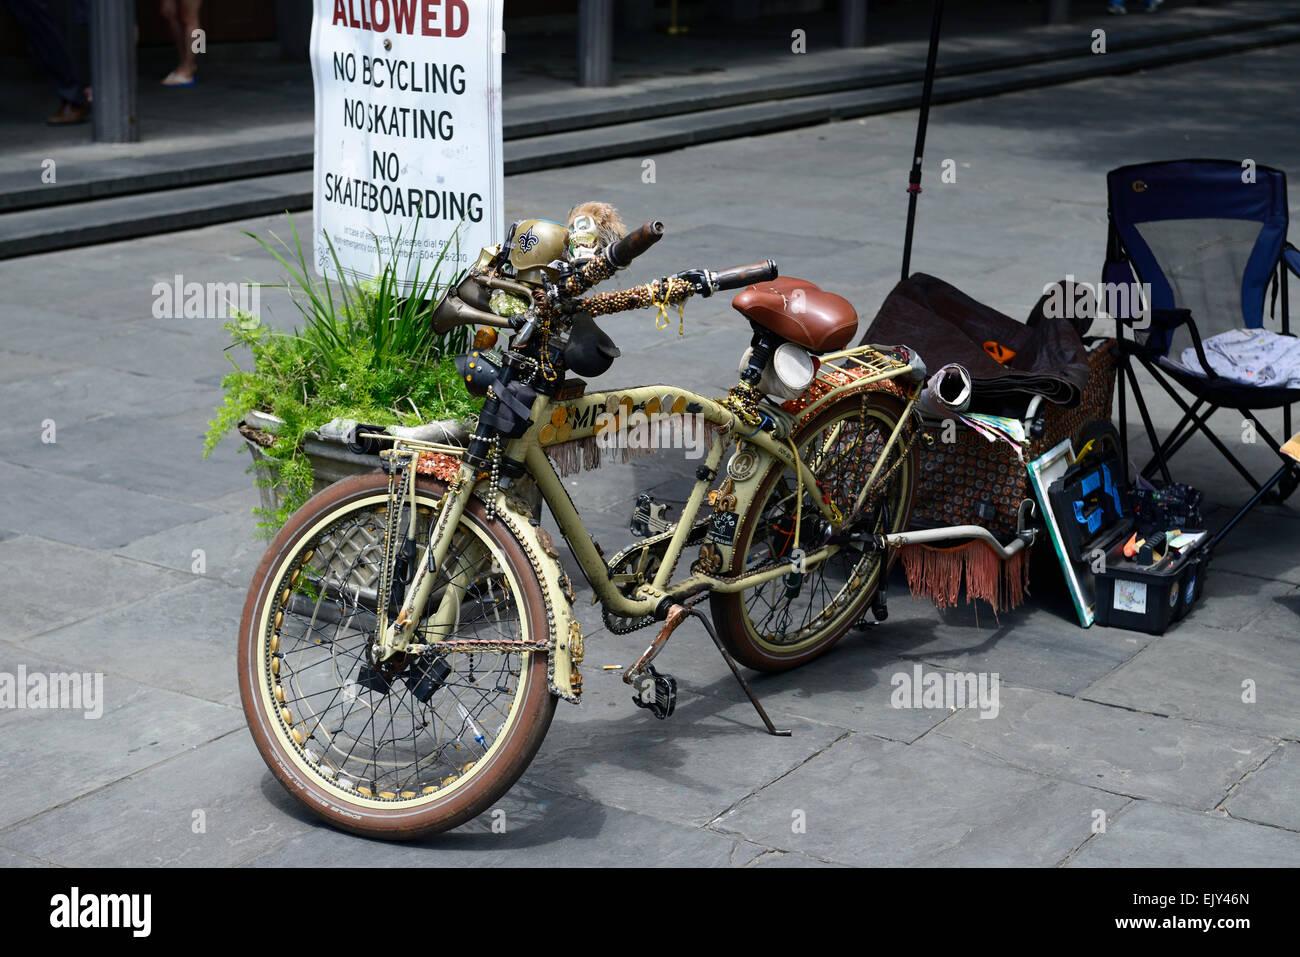 gepimpt, ausgetrickst Fahrrad Laufräder Alternativen Look Rad Jackson square new Orleans RM USA Stockbild